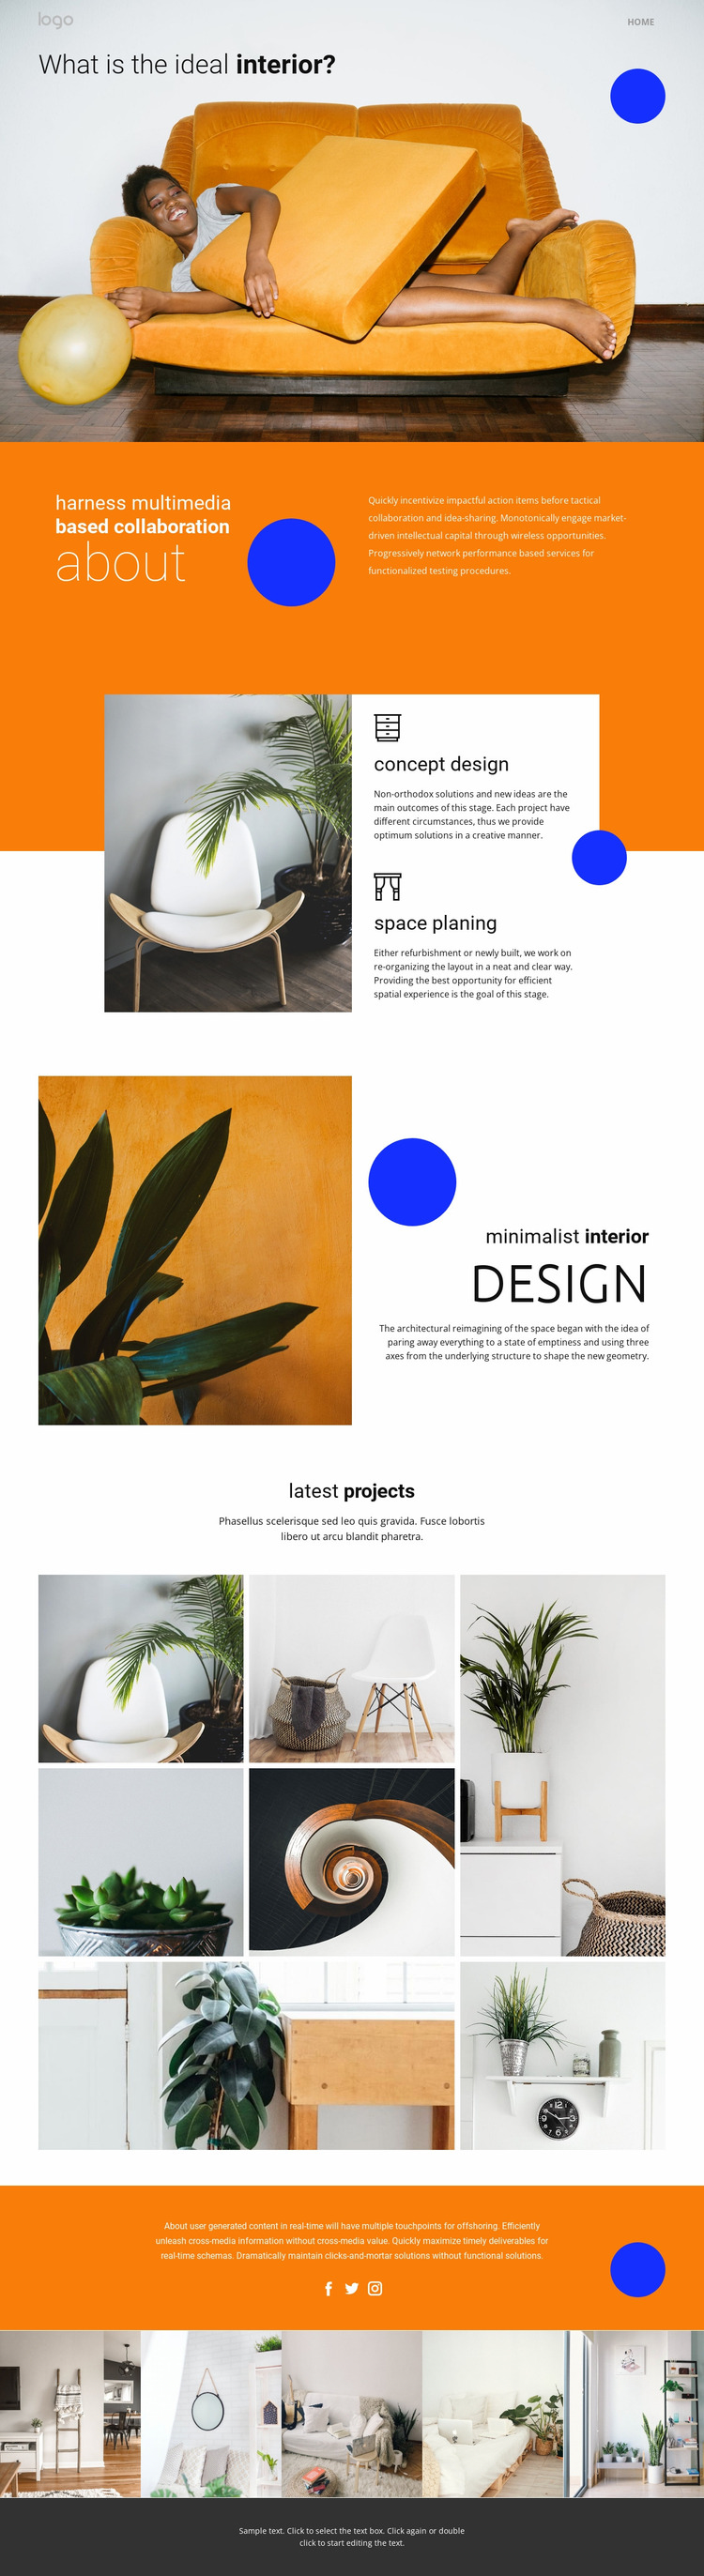 Multimedia based interior  Website Mockup